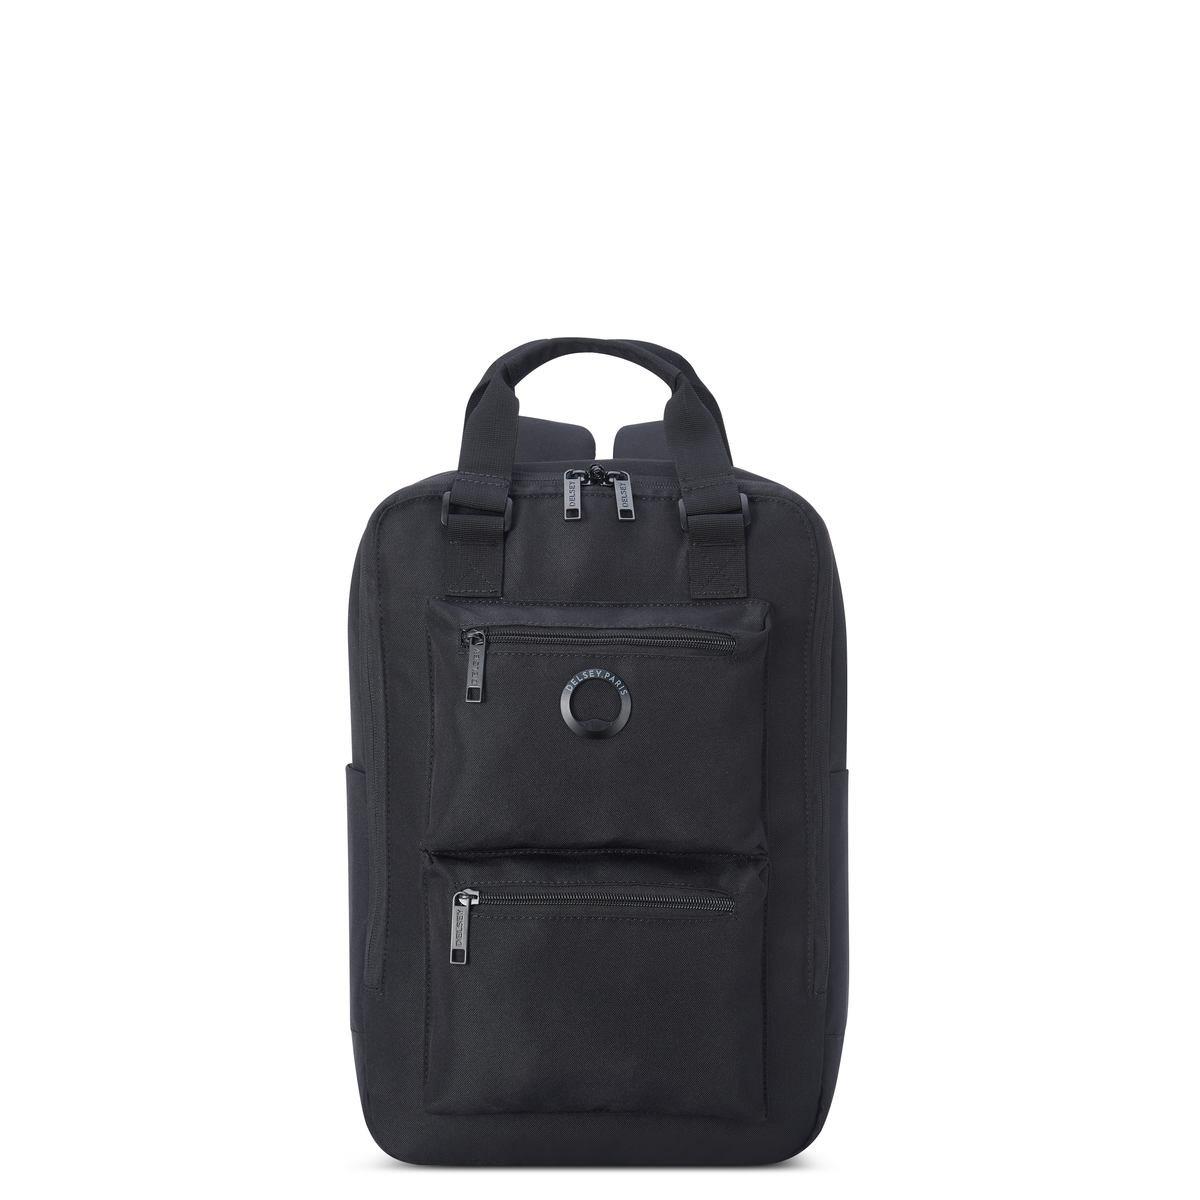 Delsey Σακίδιο πλάτης recycled 41x28.5x12.5cm για PC 15.6   σειρά Citypack Black